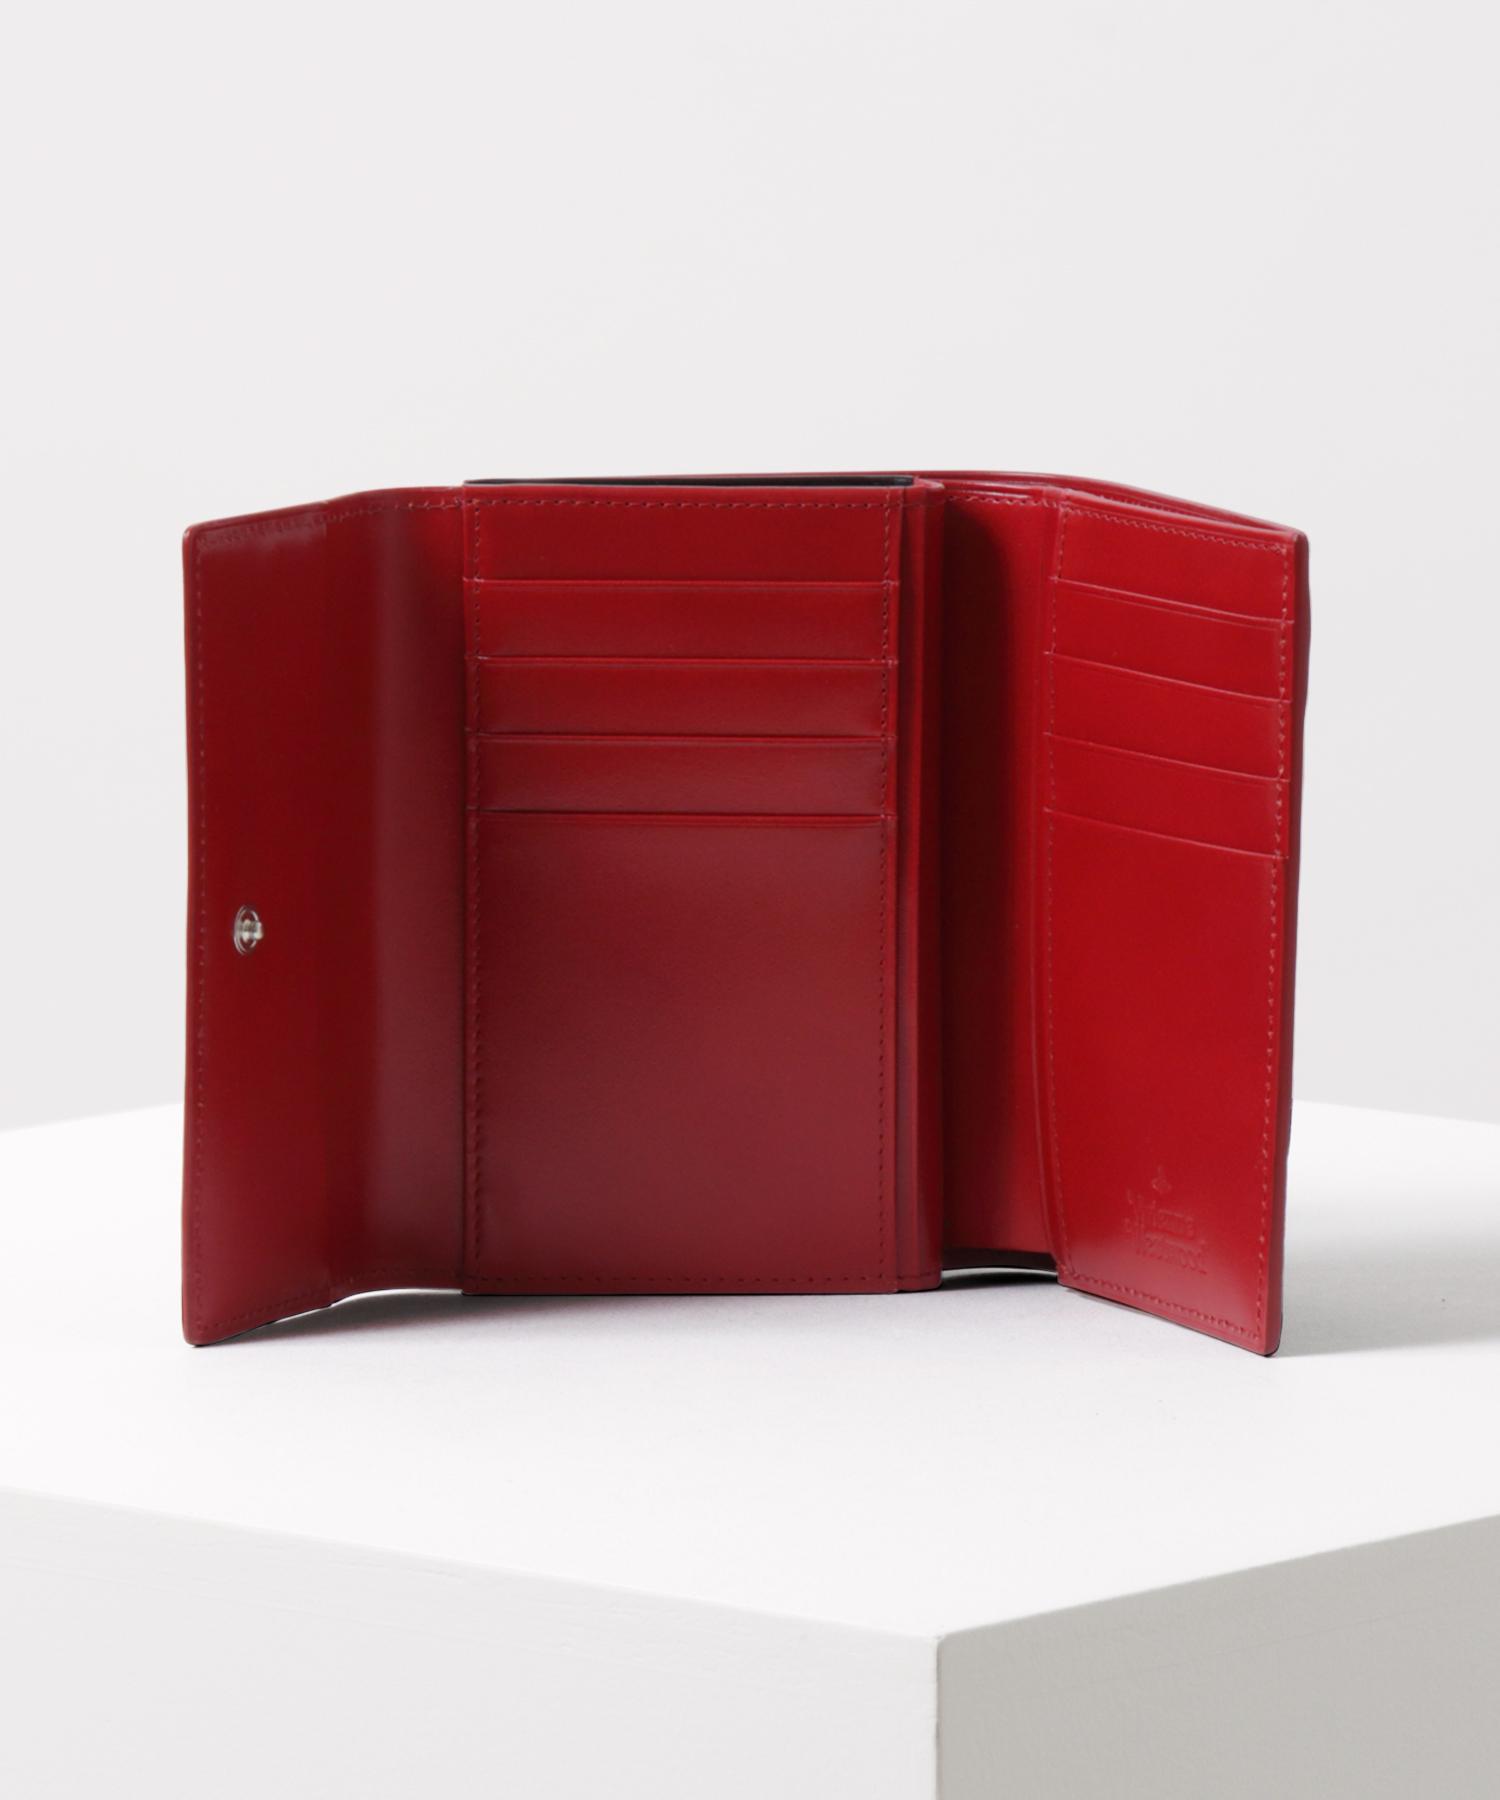 SIMPLE TINY ORB 口金二つ折り財布